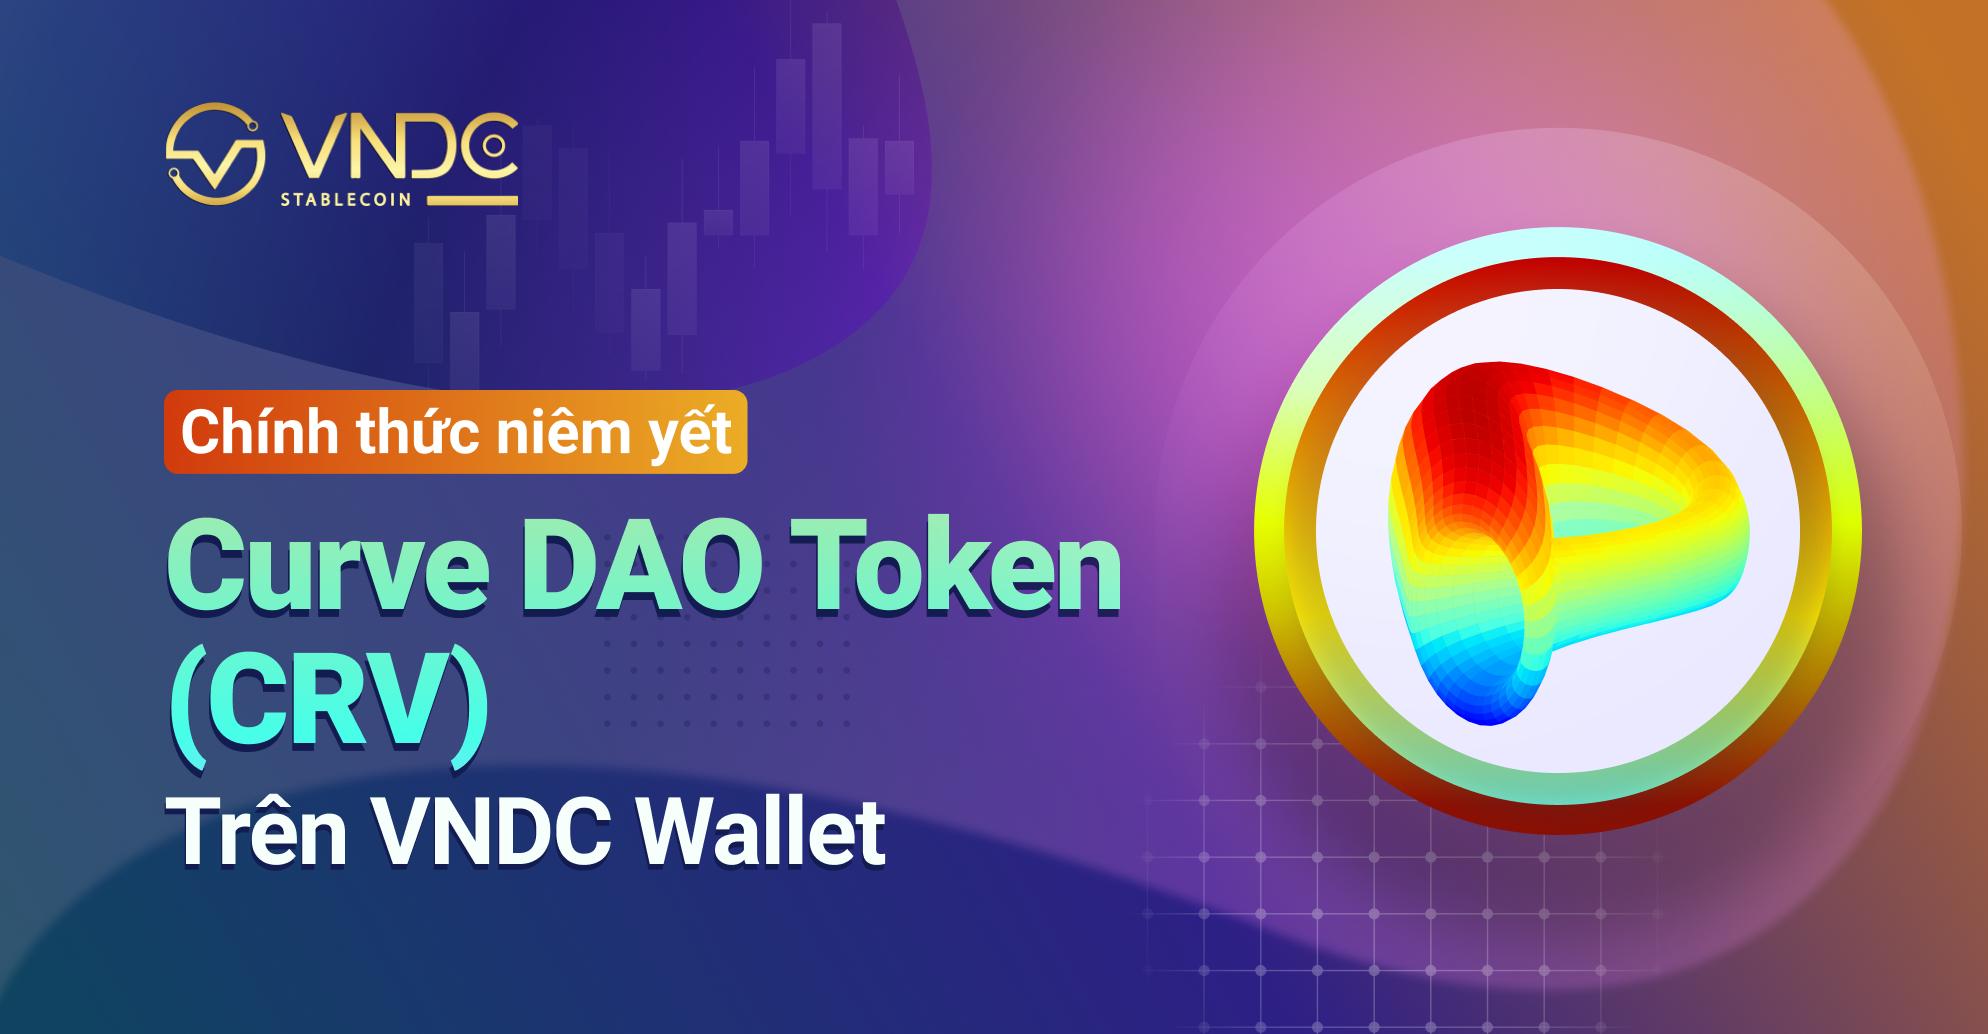 Niêm yết Curve DAO Token (CRV) trên VNDC Wallet